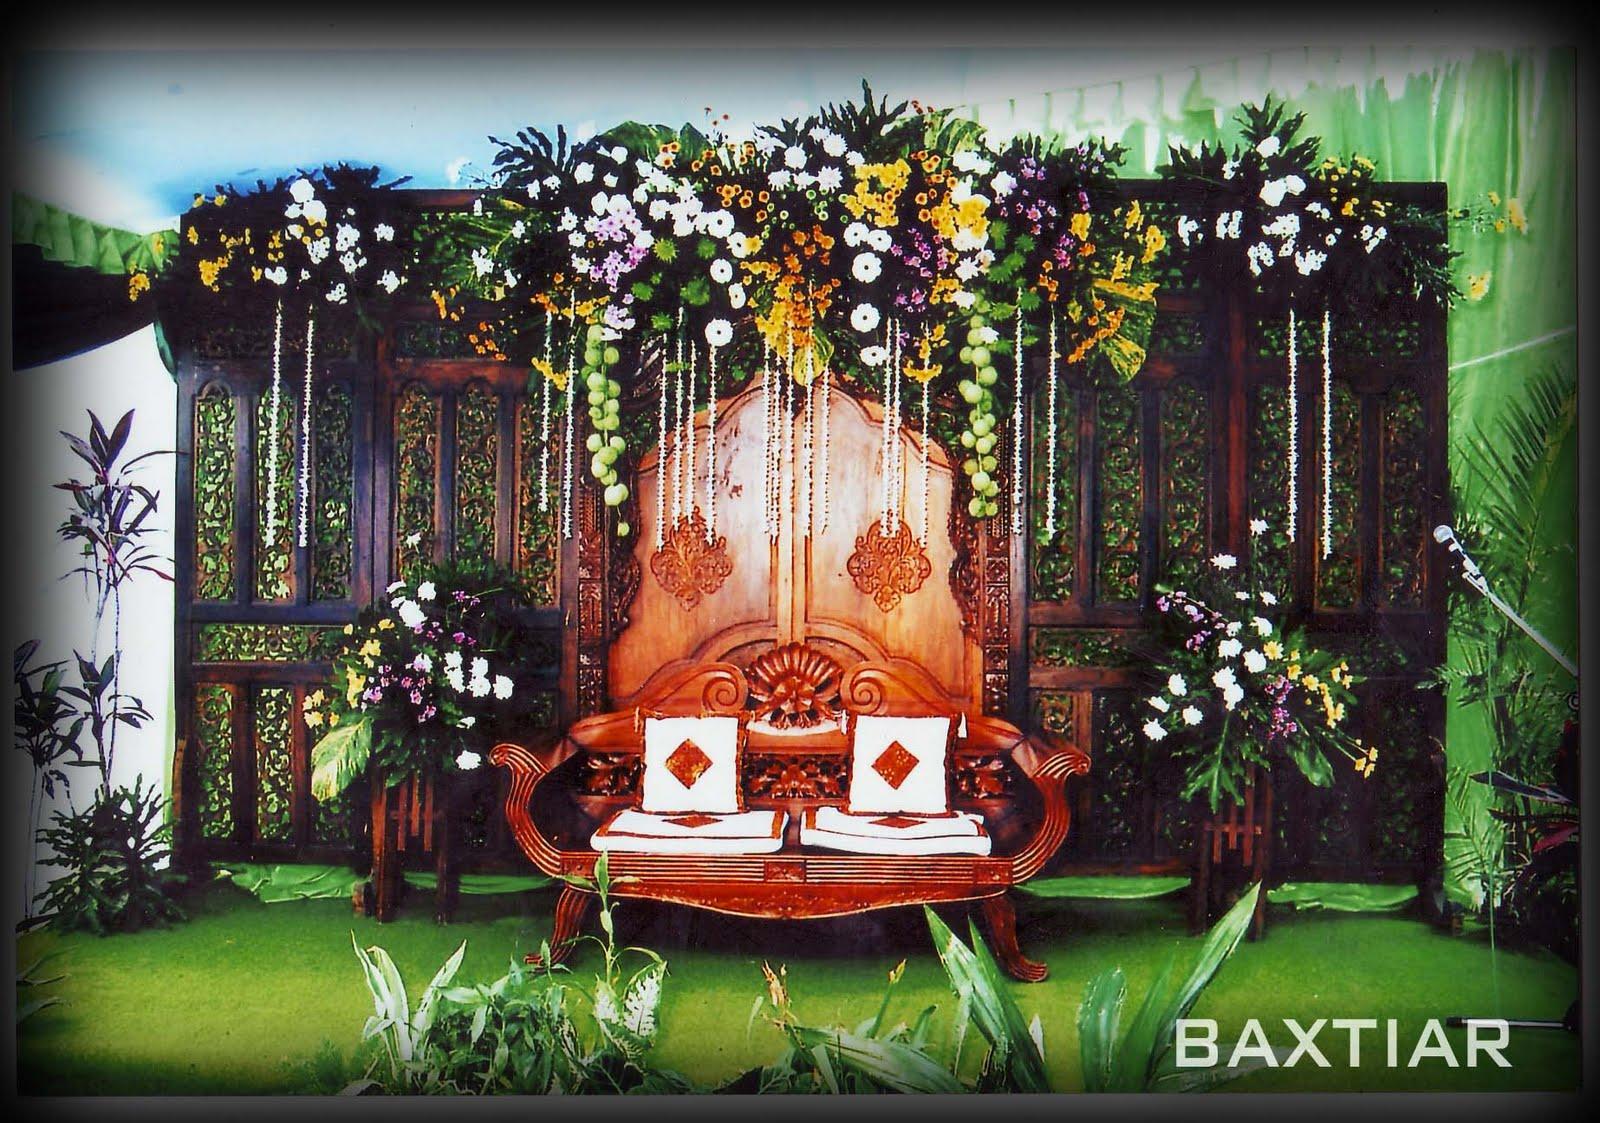 dekorasi pengantin malang: menyewakan alat alat dekorasi di Singosari ...